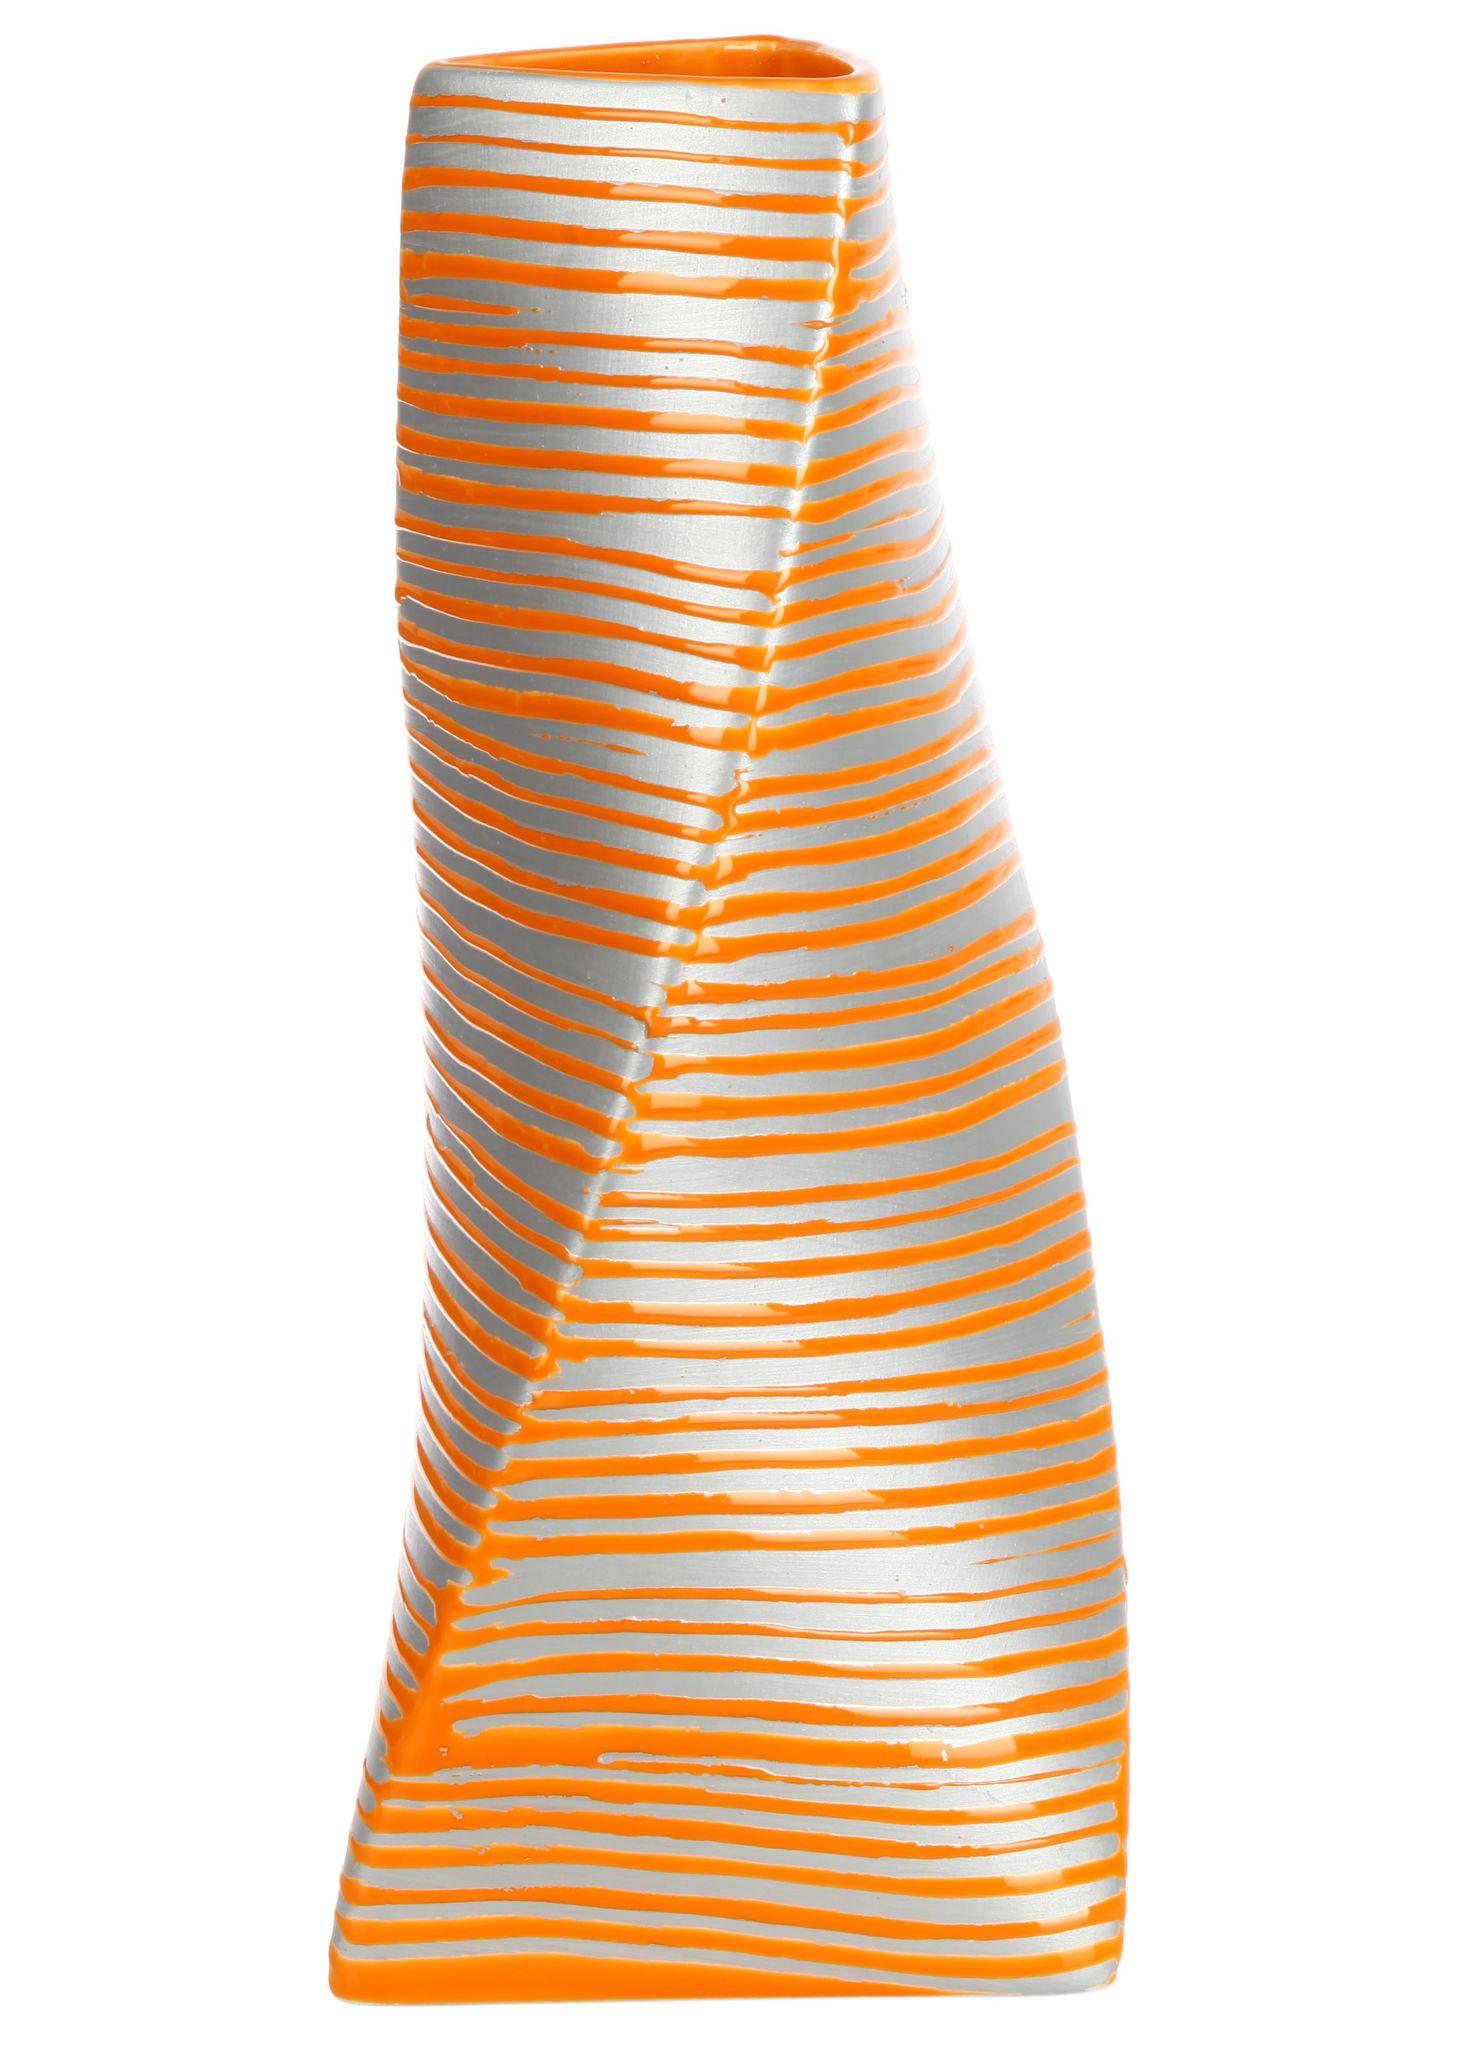 Вазы настольные Ваза декоративная Sporvil 2212-521E vaza-dekorativnaya-sporvil-2212-521e-portugaliya.jpg